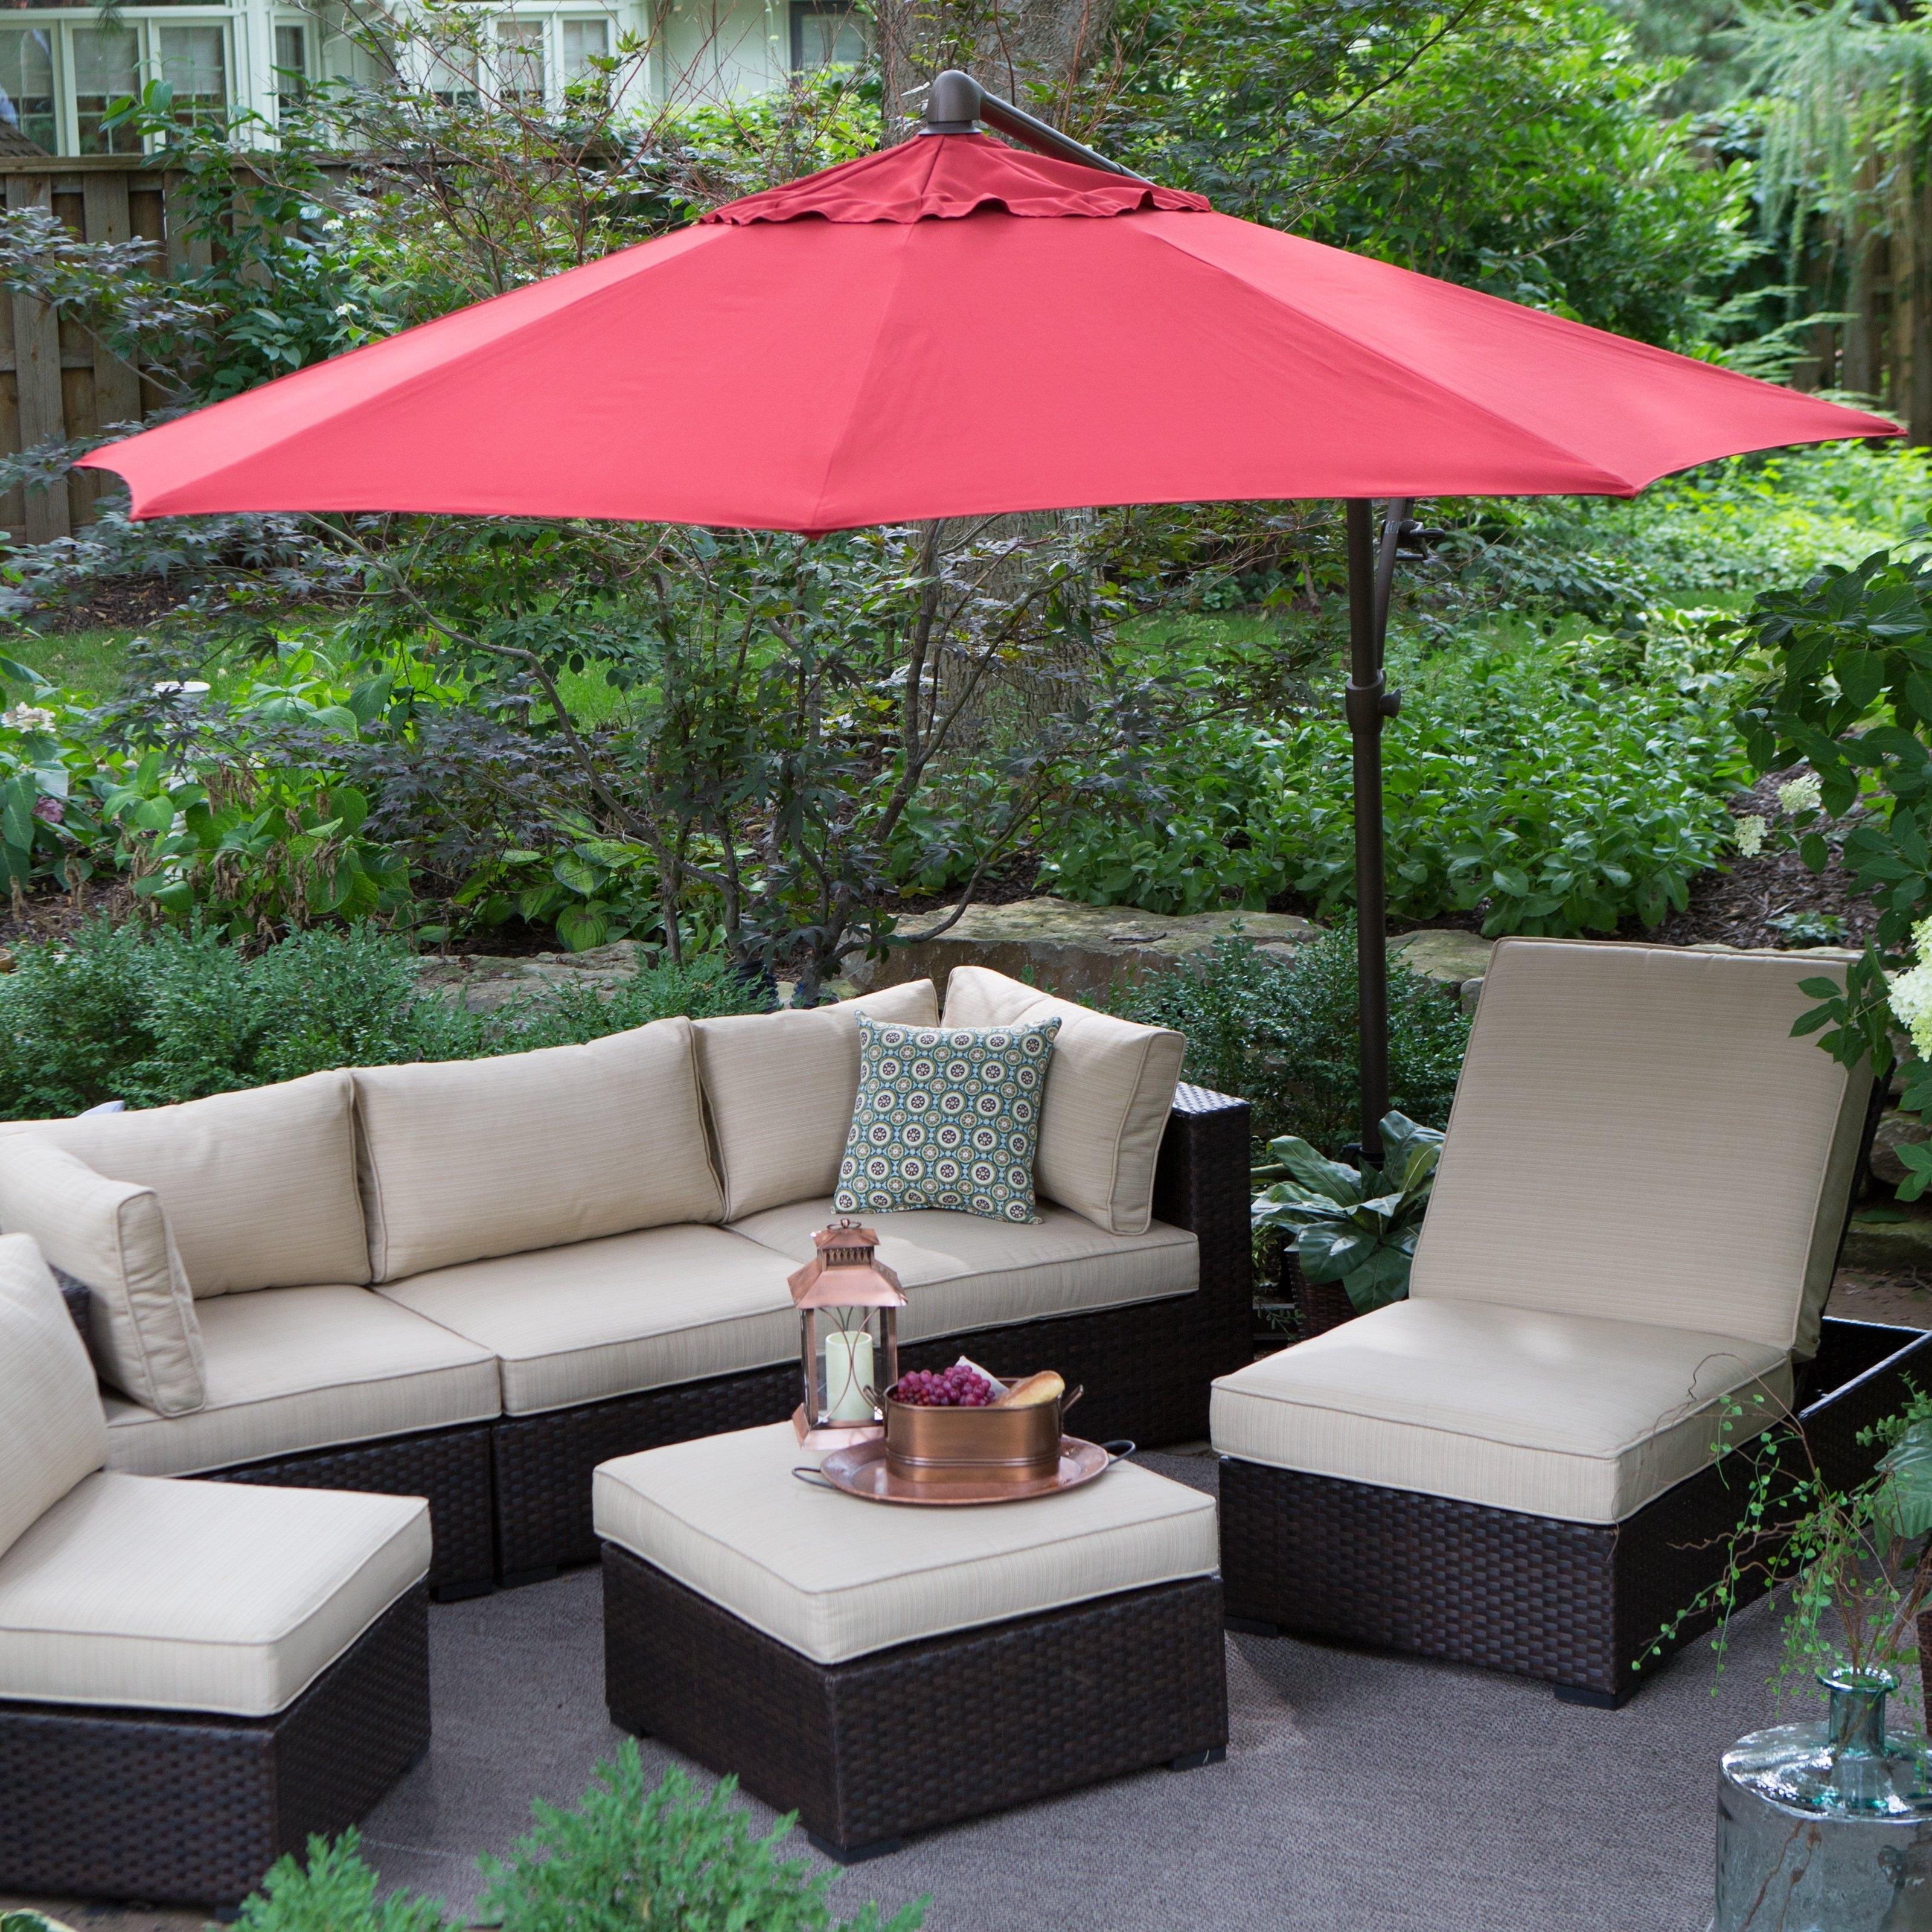 Newest Sunbrella Patio Umbrellas At Walmart Intended For Treasure Garden 10 Ft (View 3 of 20)